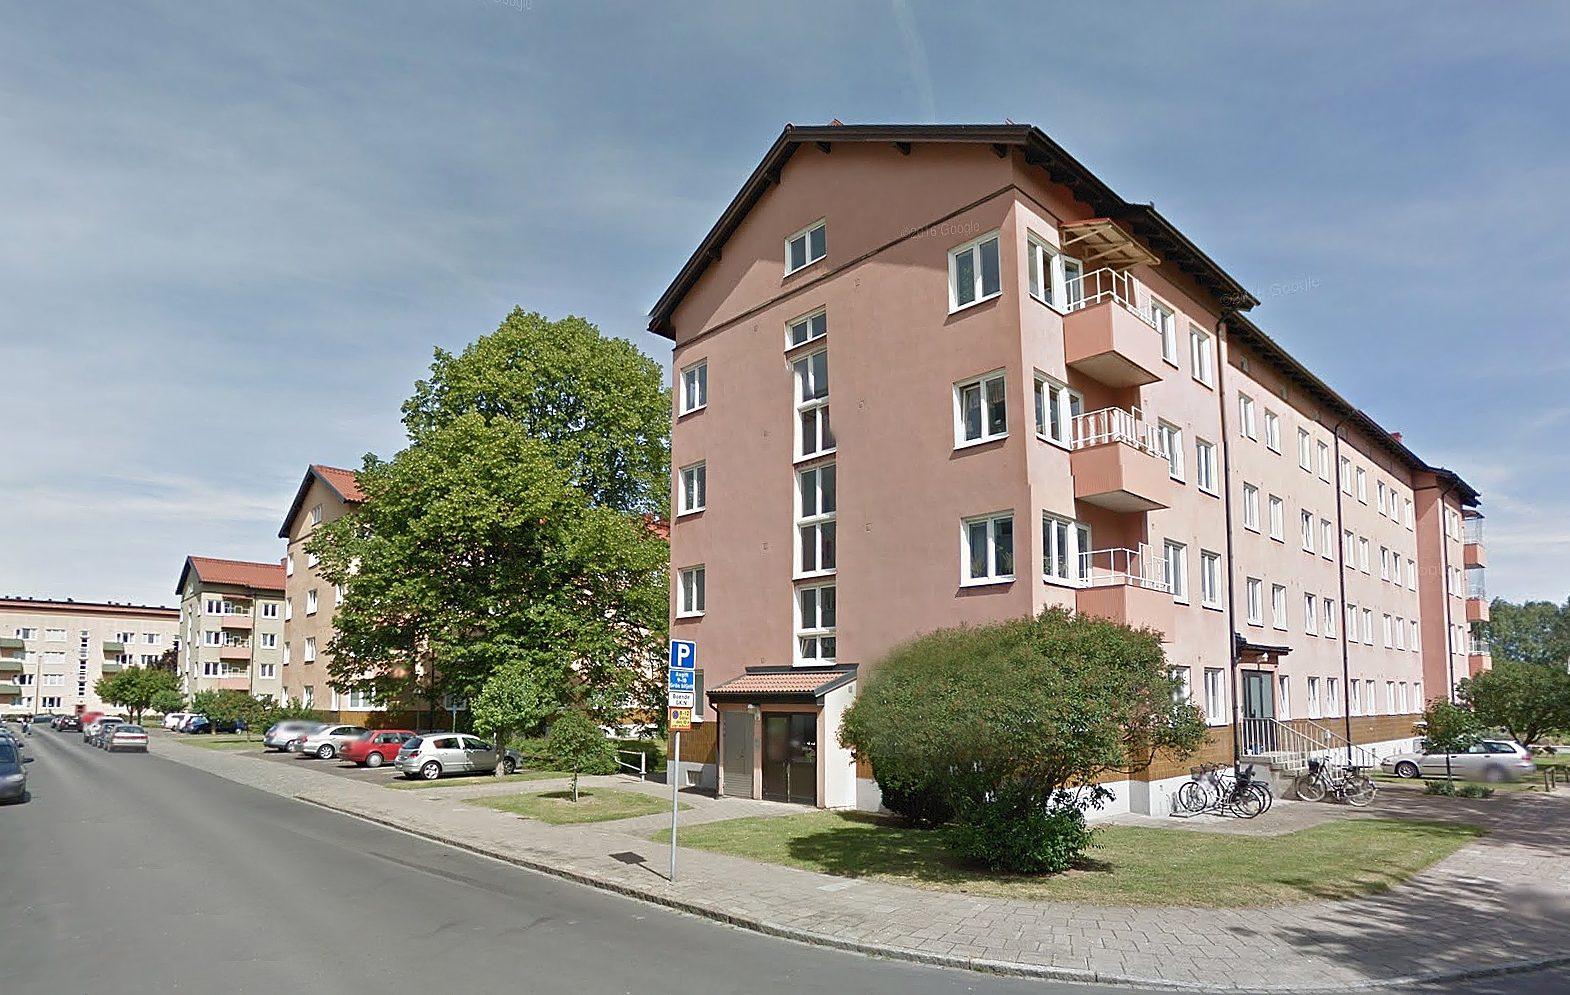 Brf Svenstorp 1 i Malmö